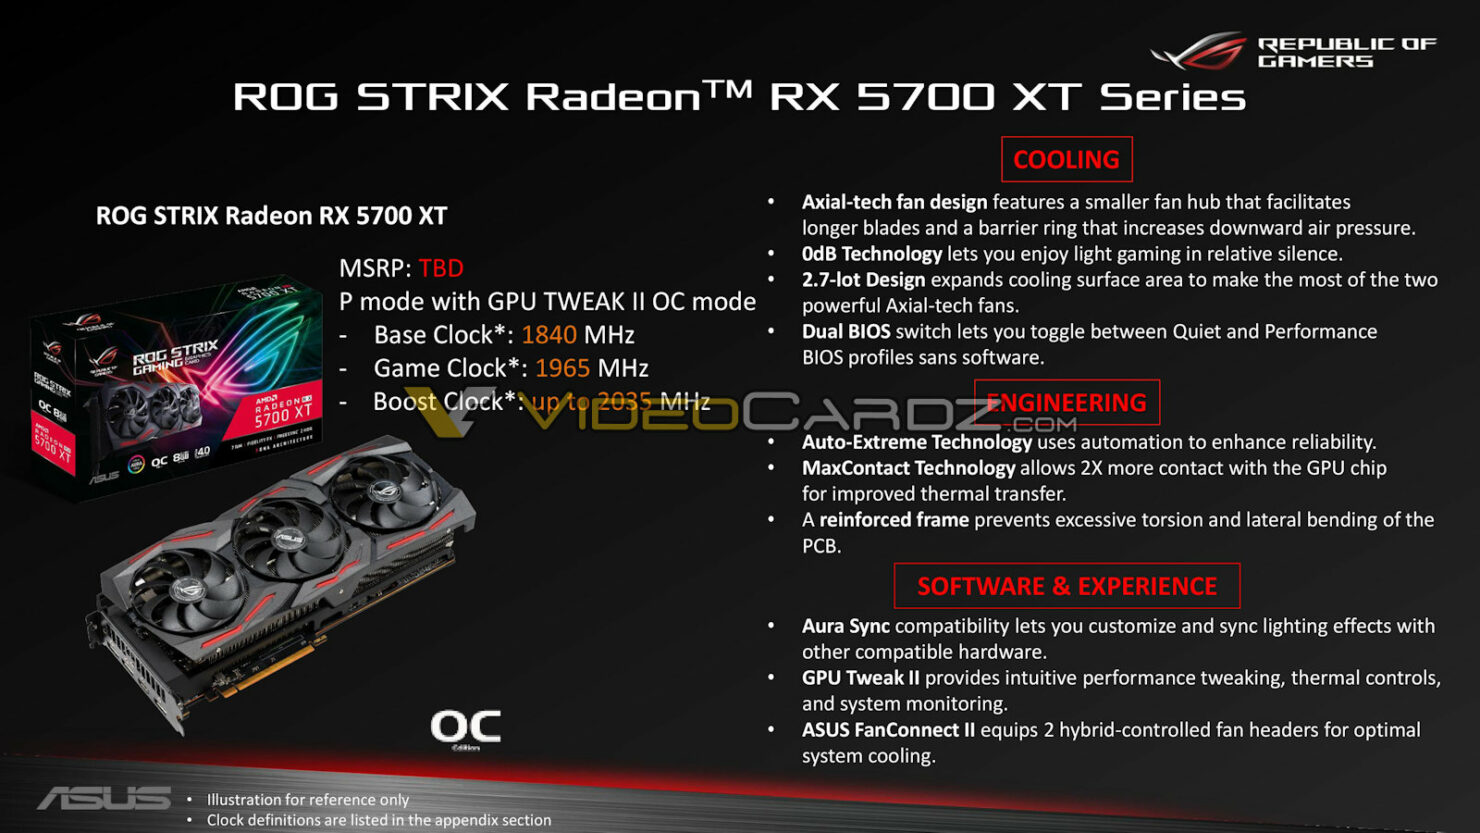 asus-rog-strix-rx-5700xt-review-kit-0002